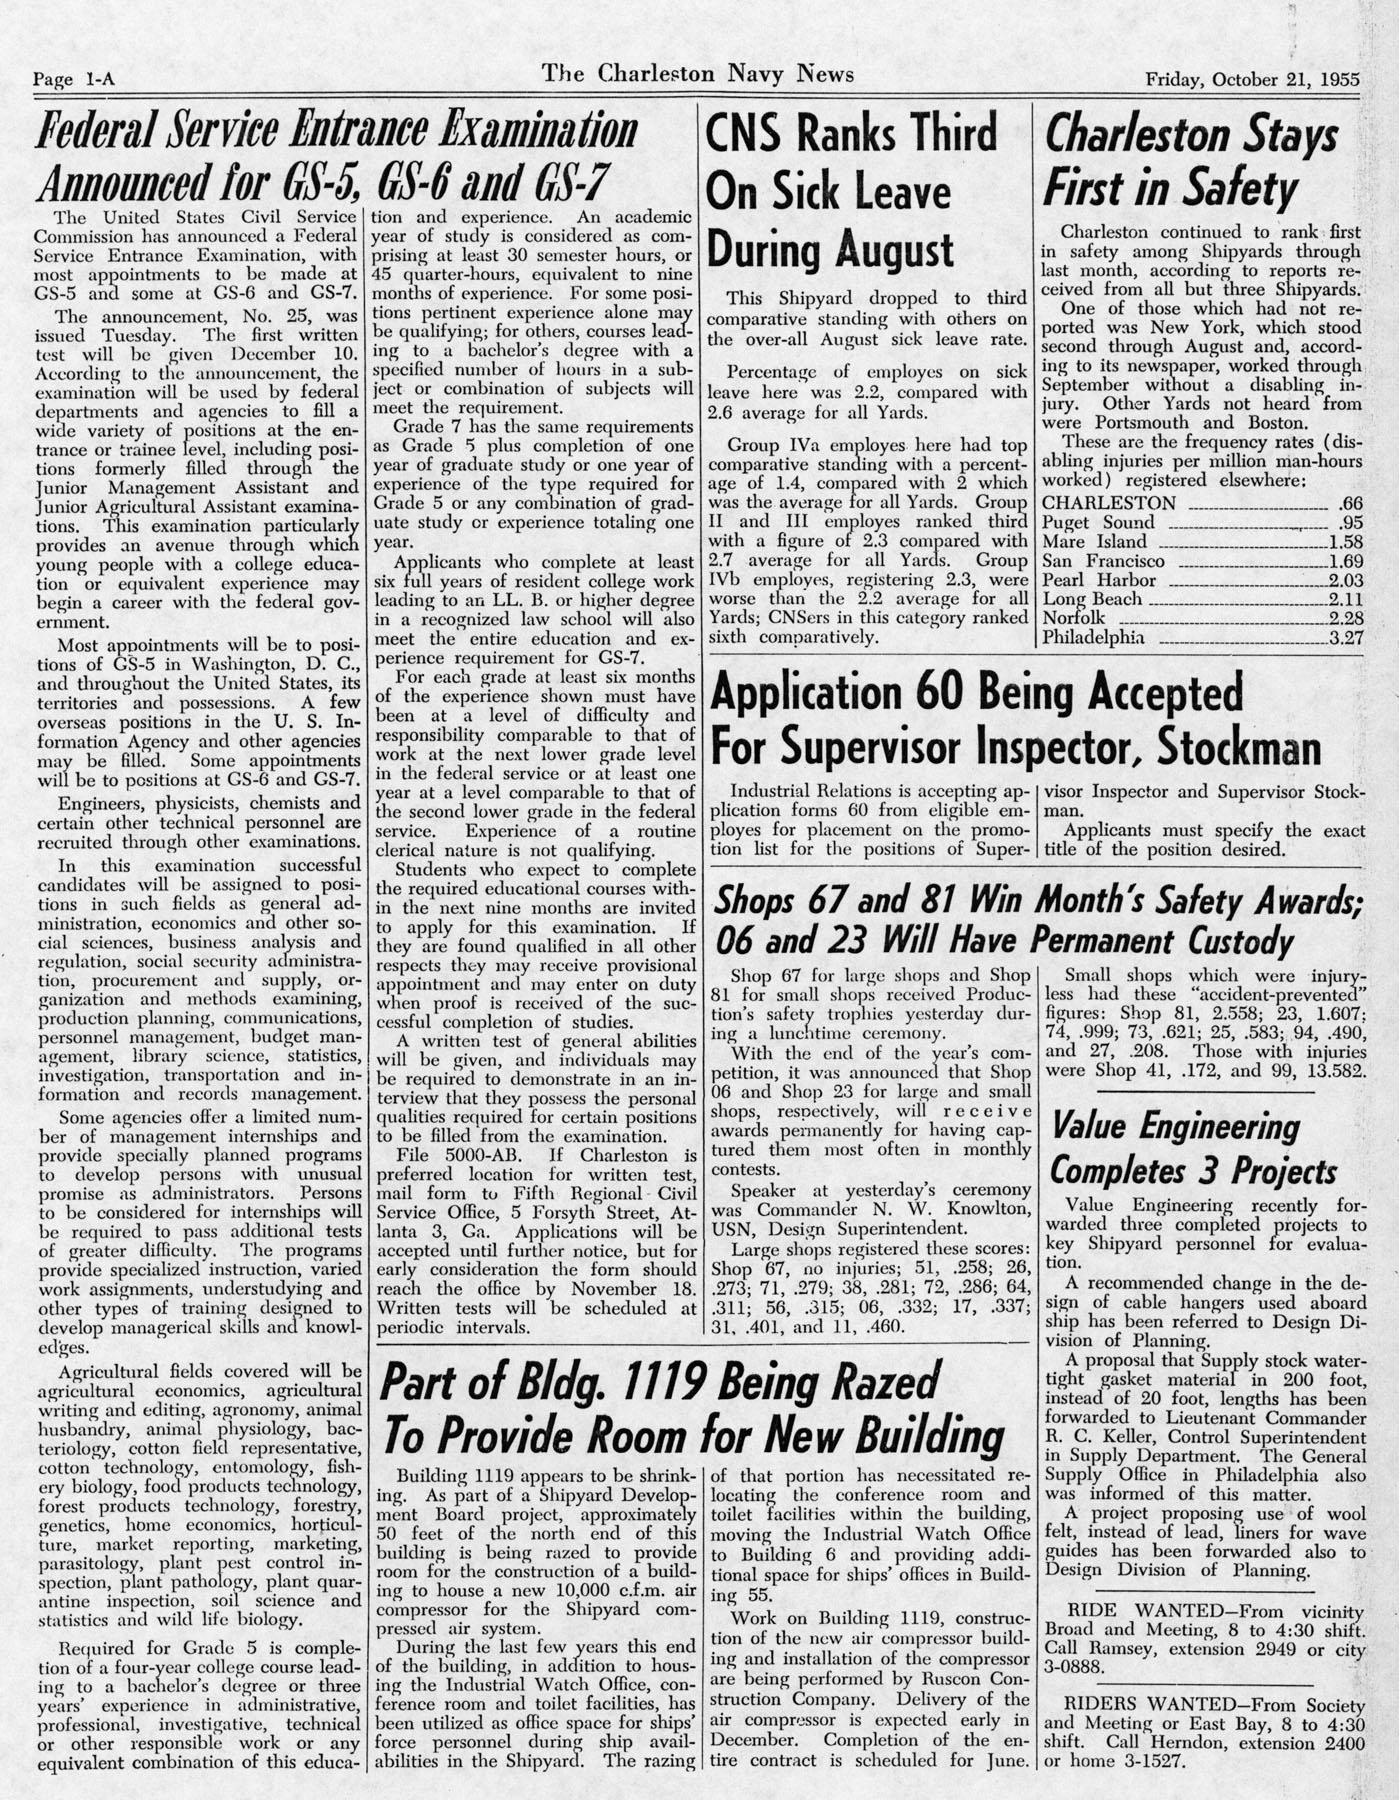 The Charleston Navy News, Volume 14, Edition 7, page ia